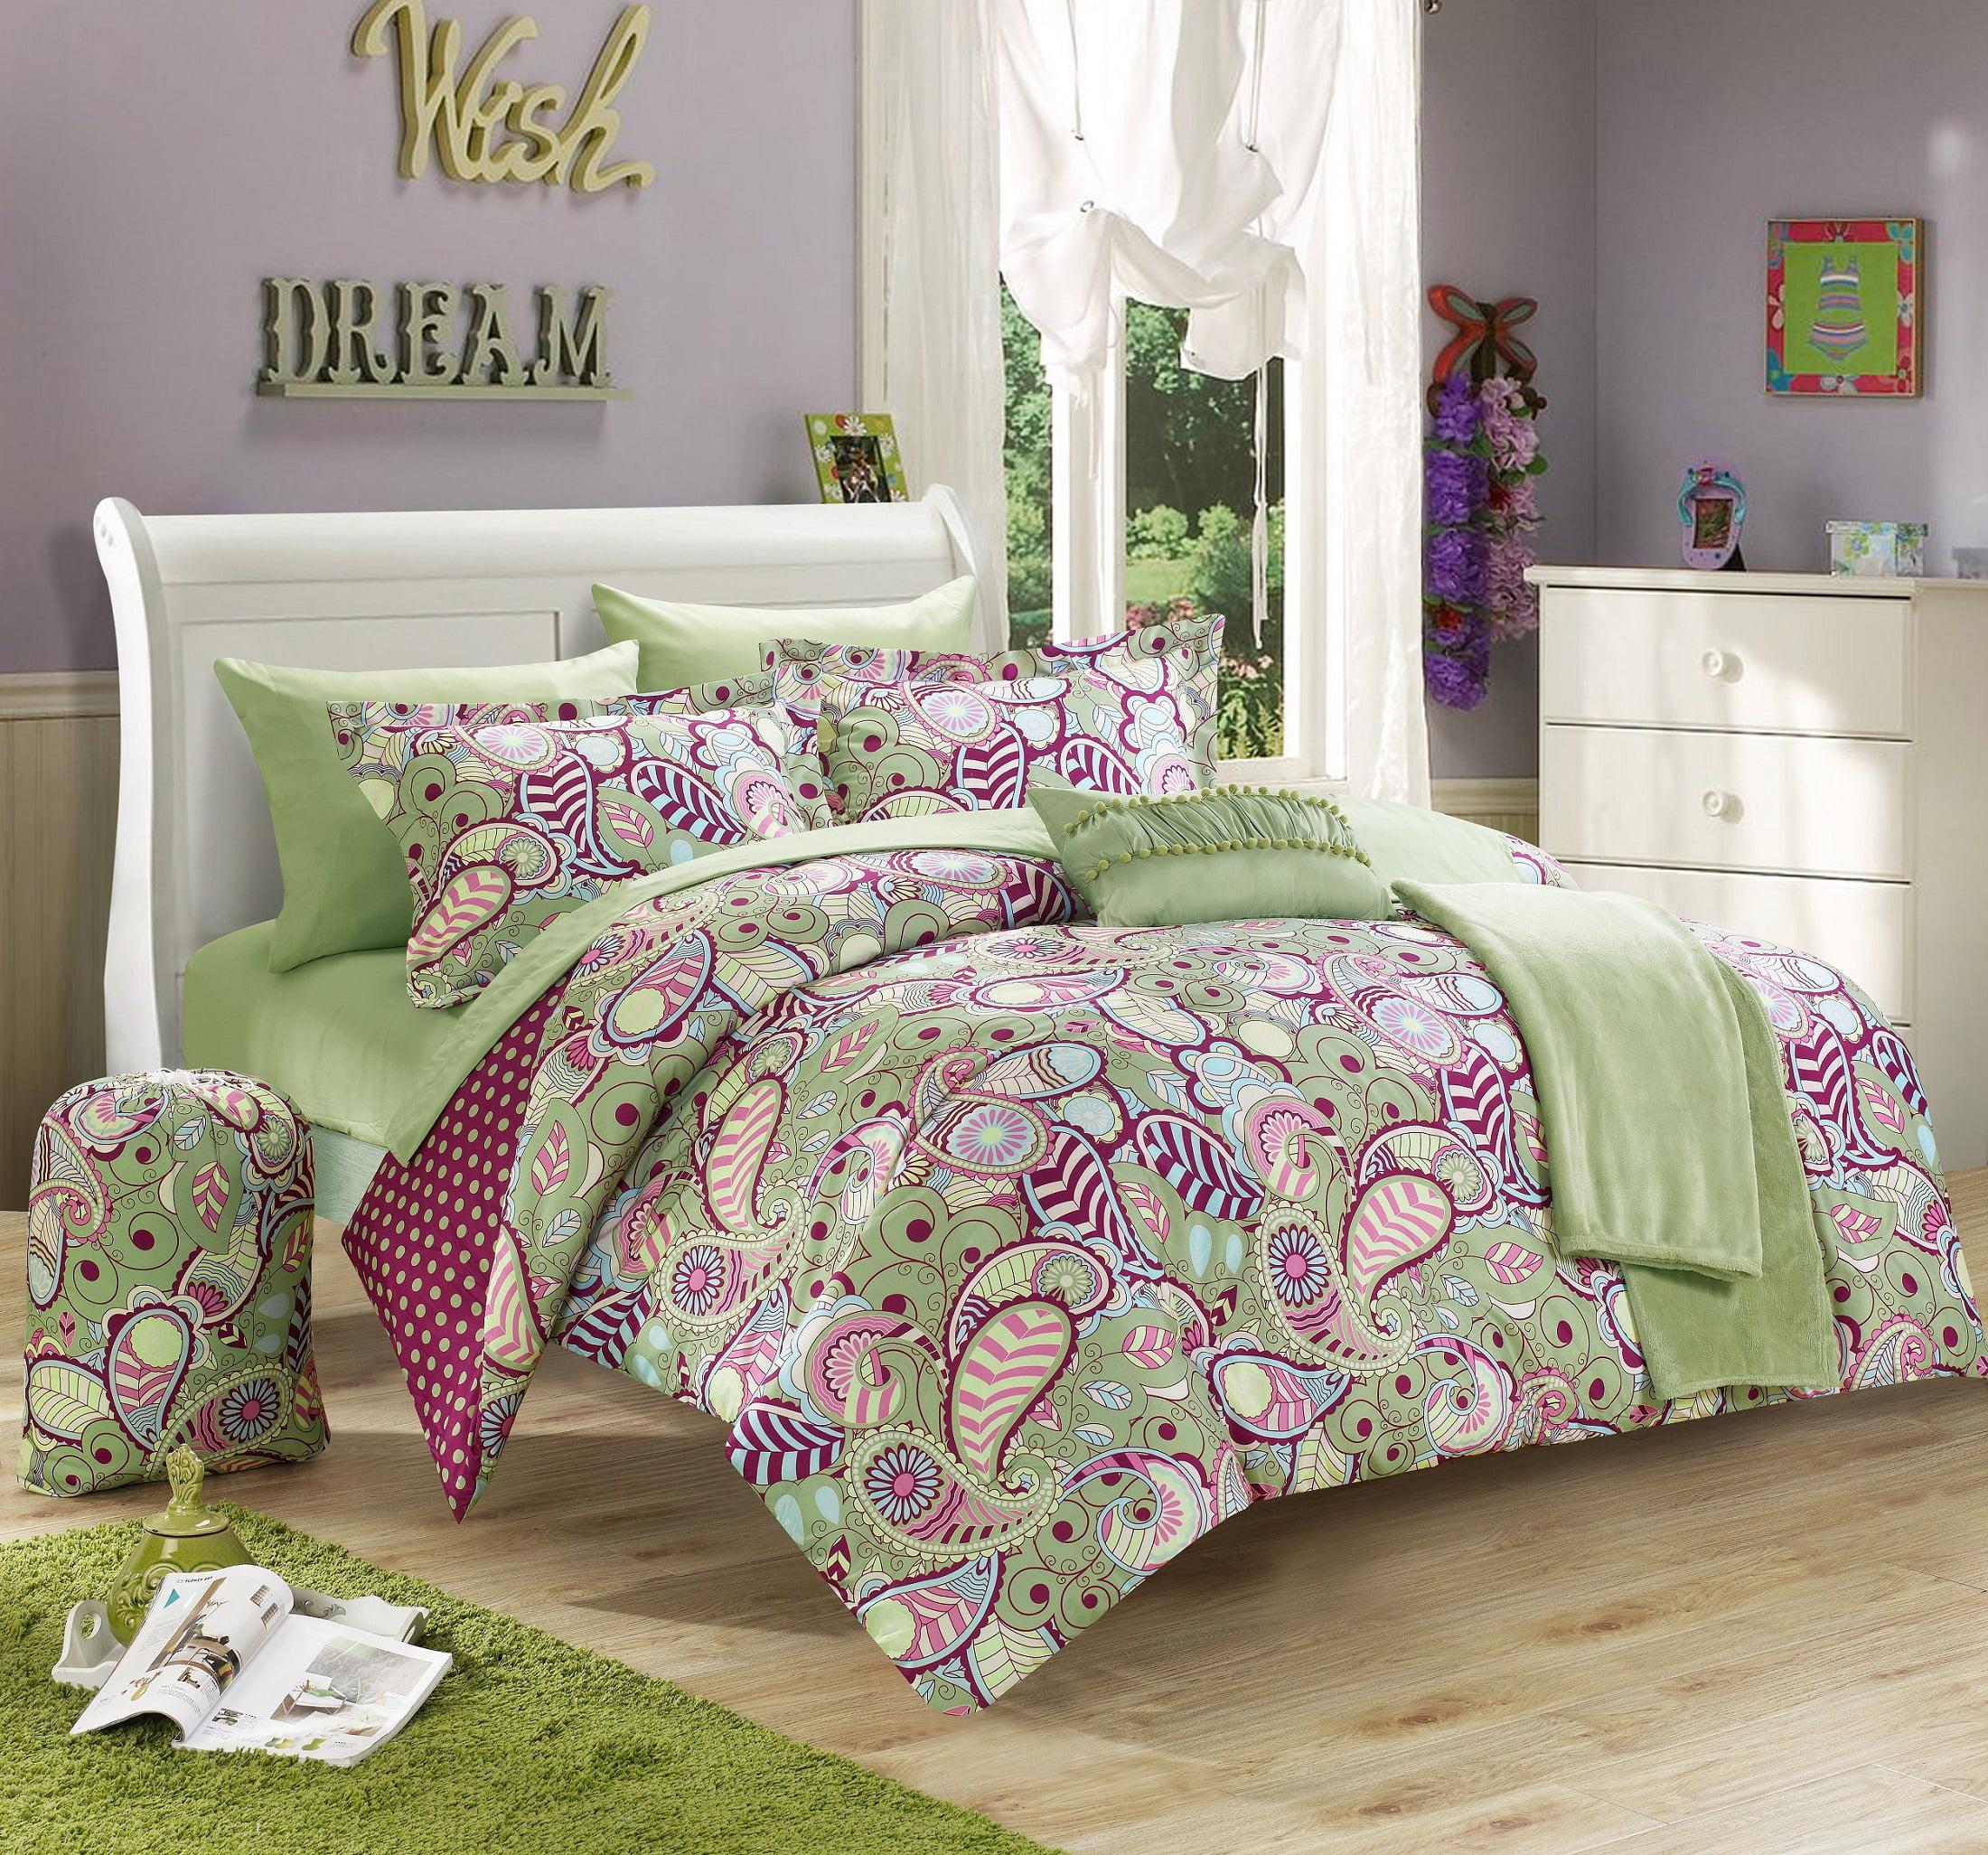 Chic Home Duchess 10 Piece Reversible Comforter Set